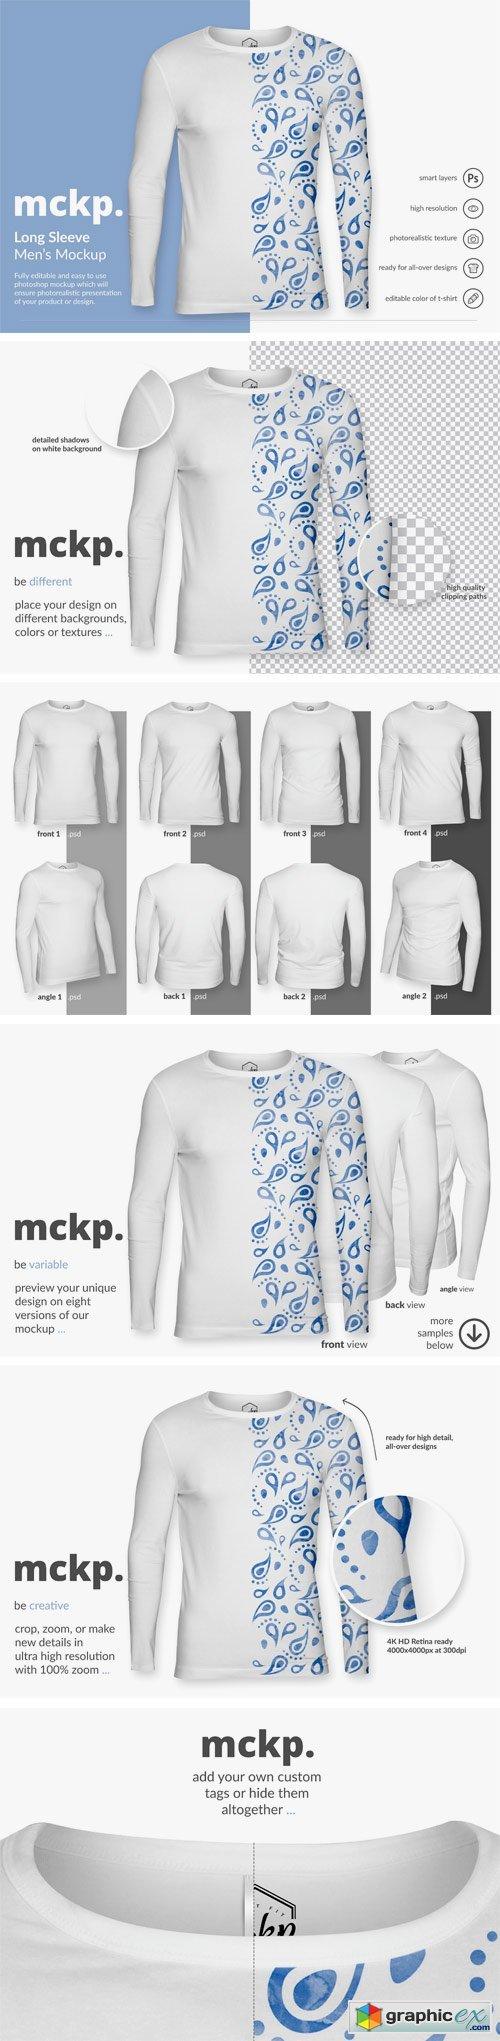 Long Sleeve by mckp - Men's Mockup